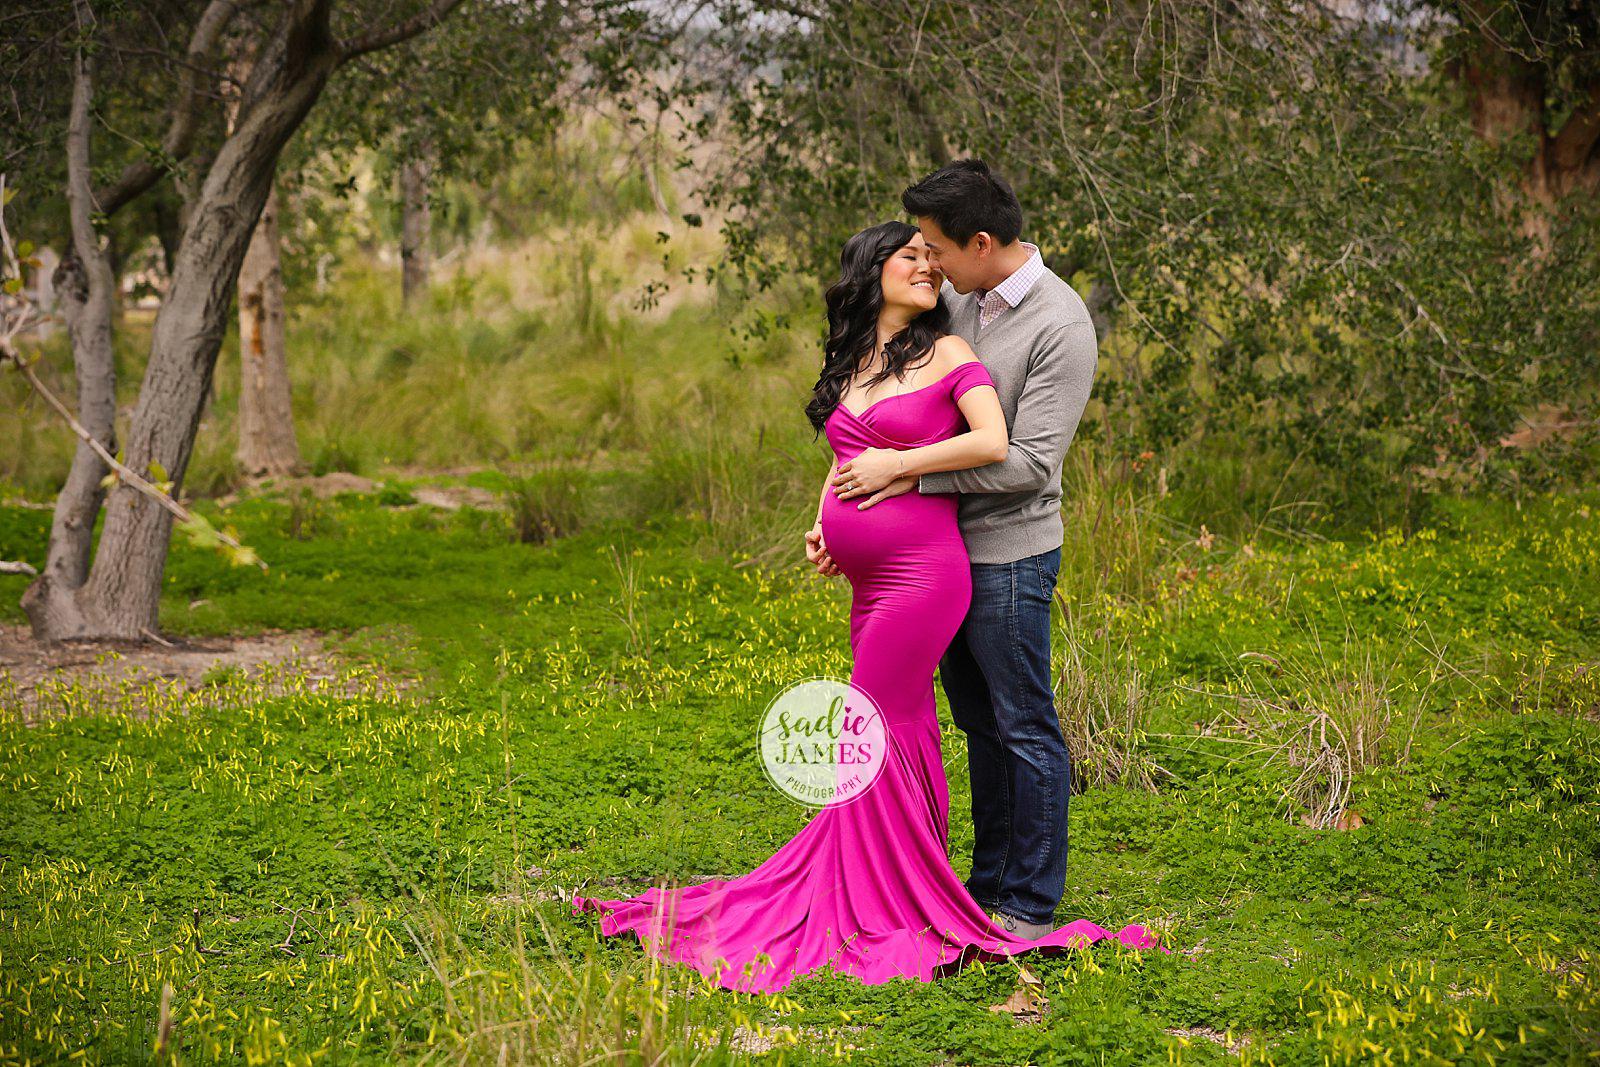 Sadie James Photography | CA Maternity Photographer, California Maternity Photographer, Maternity photographer in California, Yorba Linda Maternity photographer, Orange County Maternity Photographer